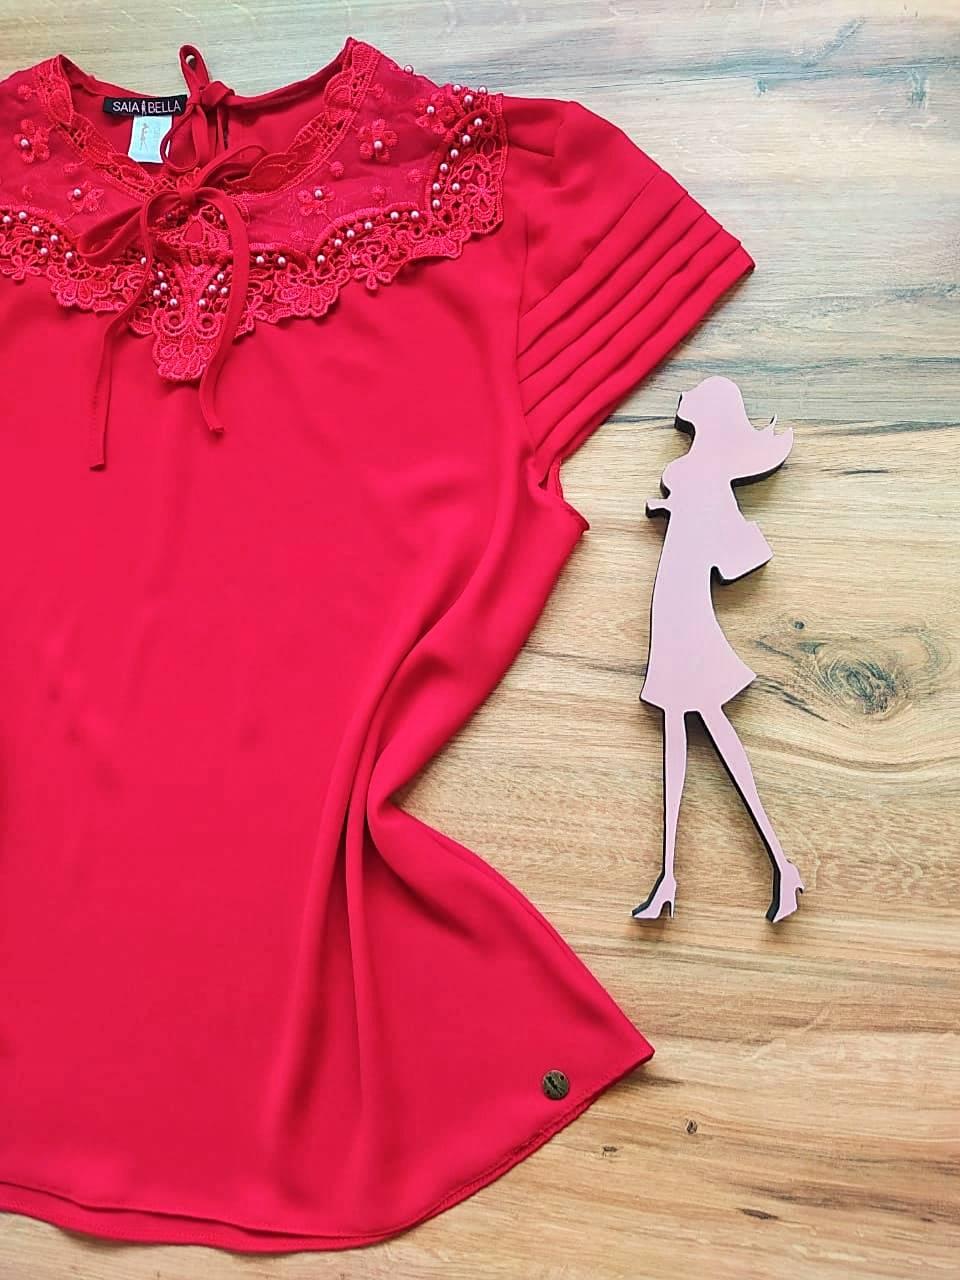 Blusa Nessa de Renda Saia Bella - SB21470 Vermelho Plus Size